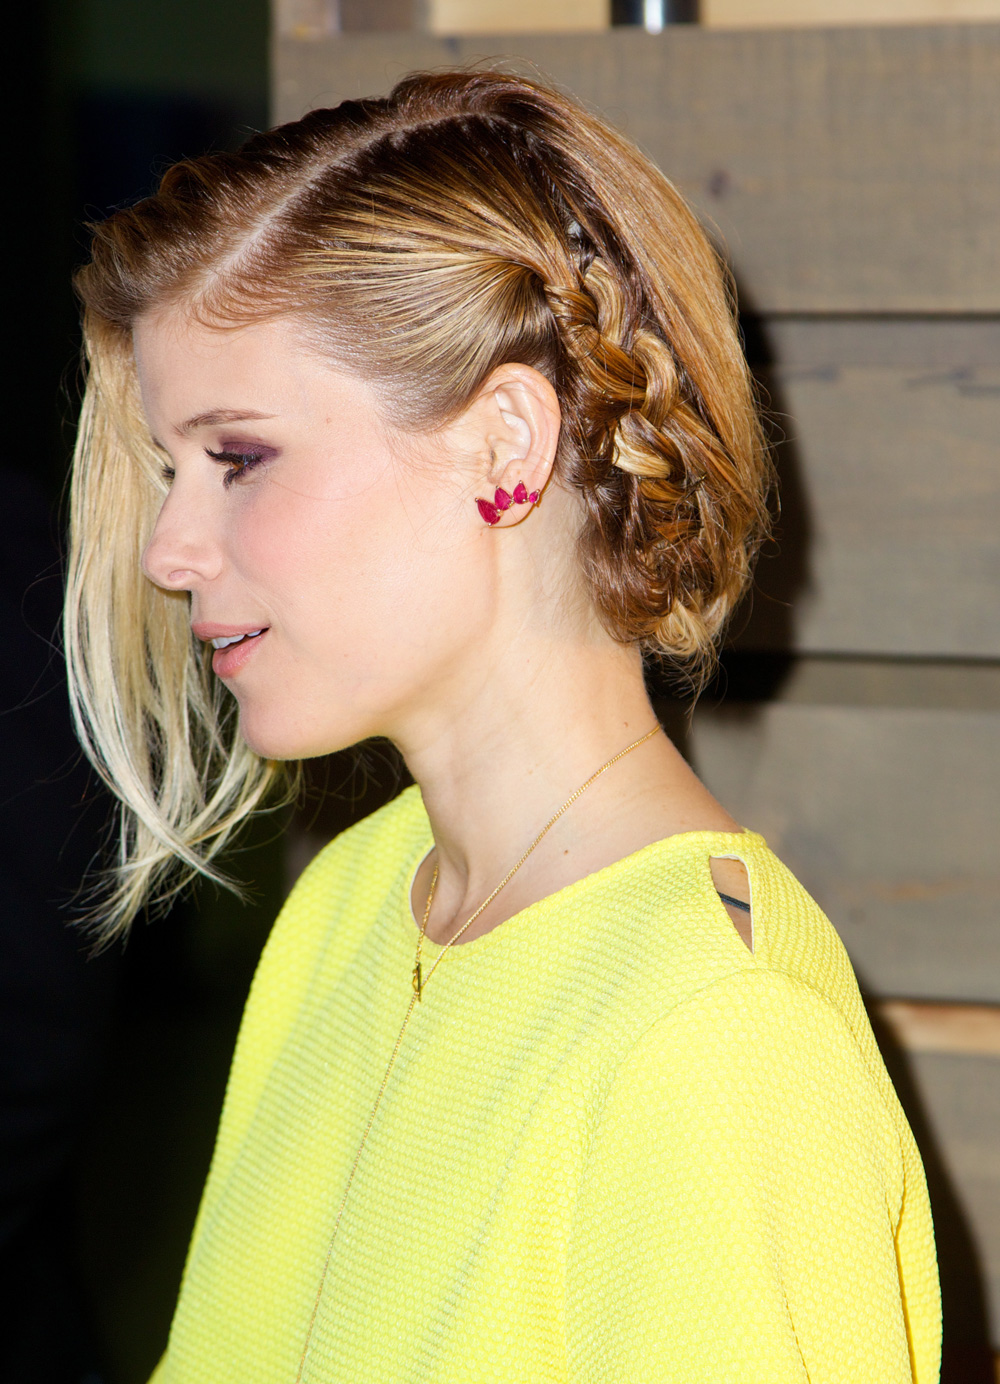 Best braid: Kate Mara